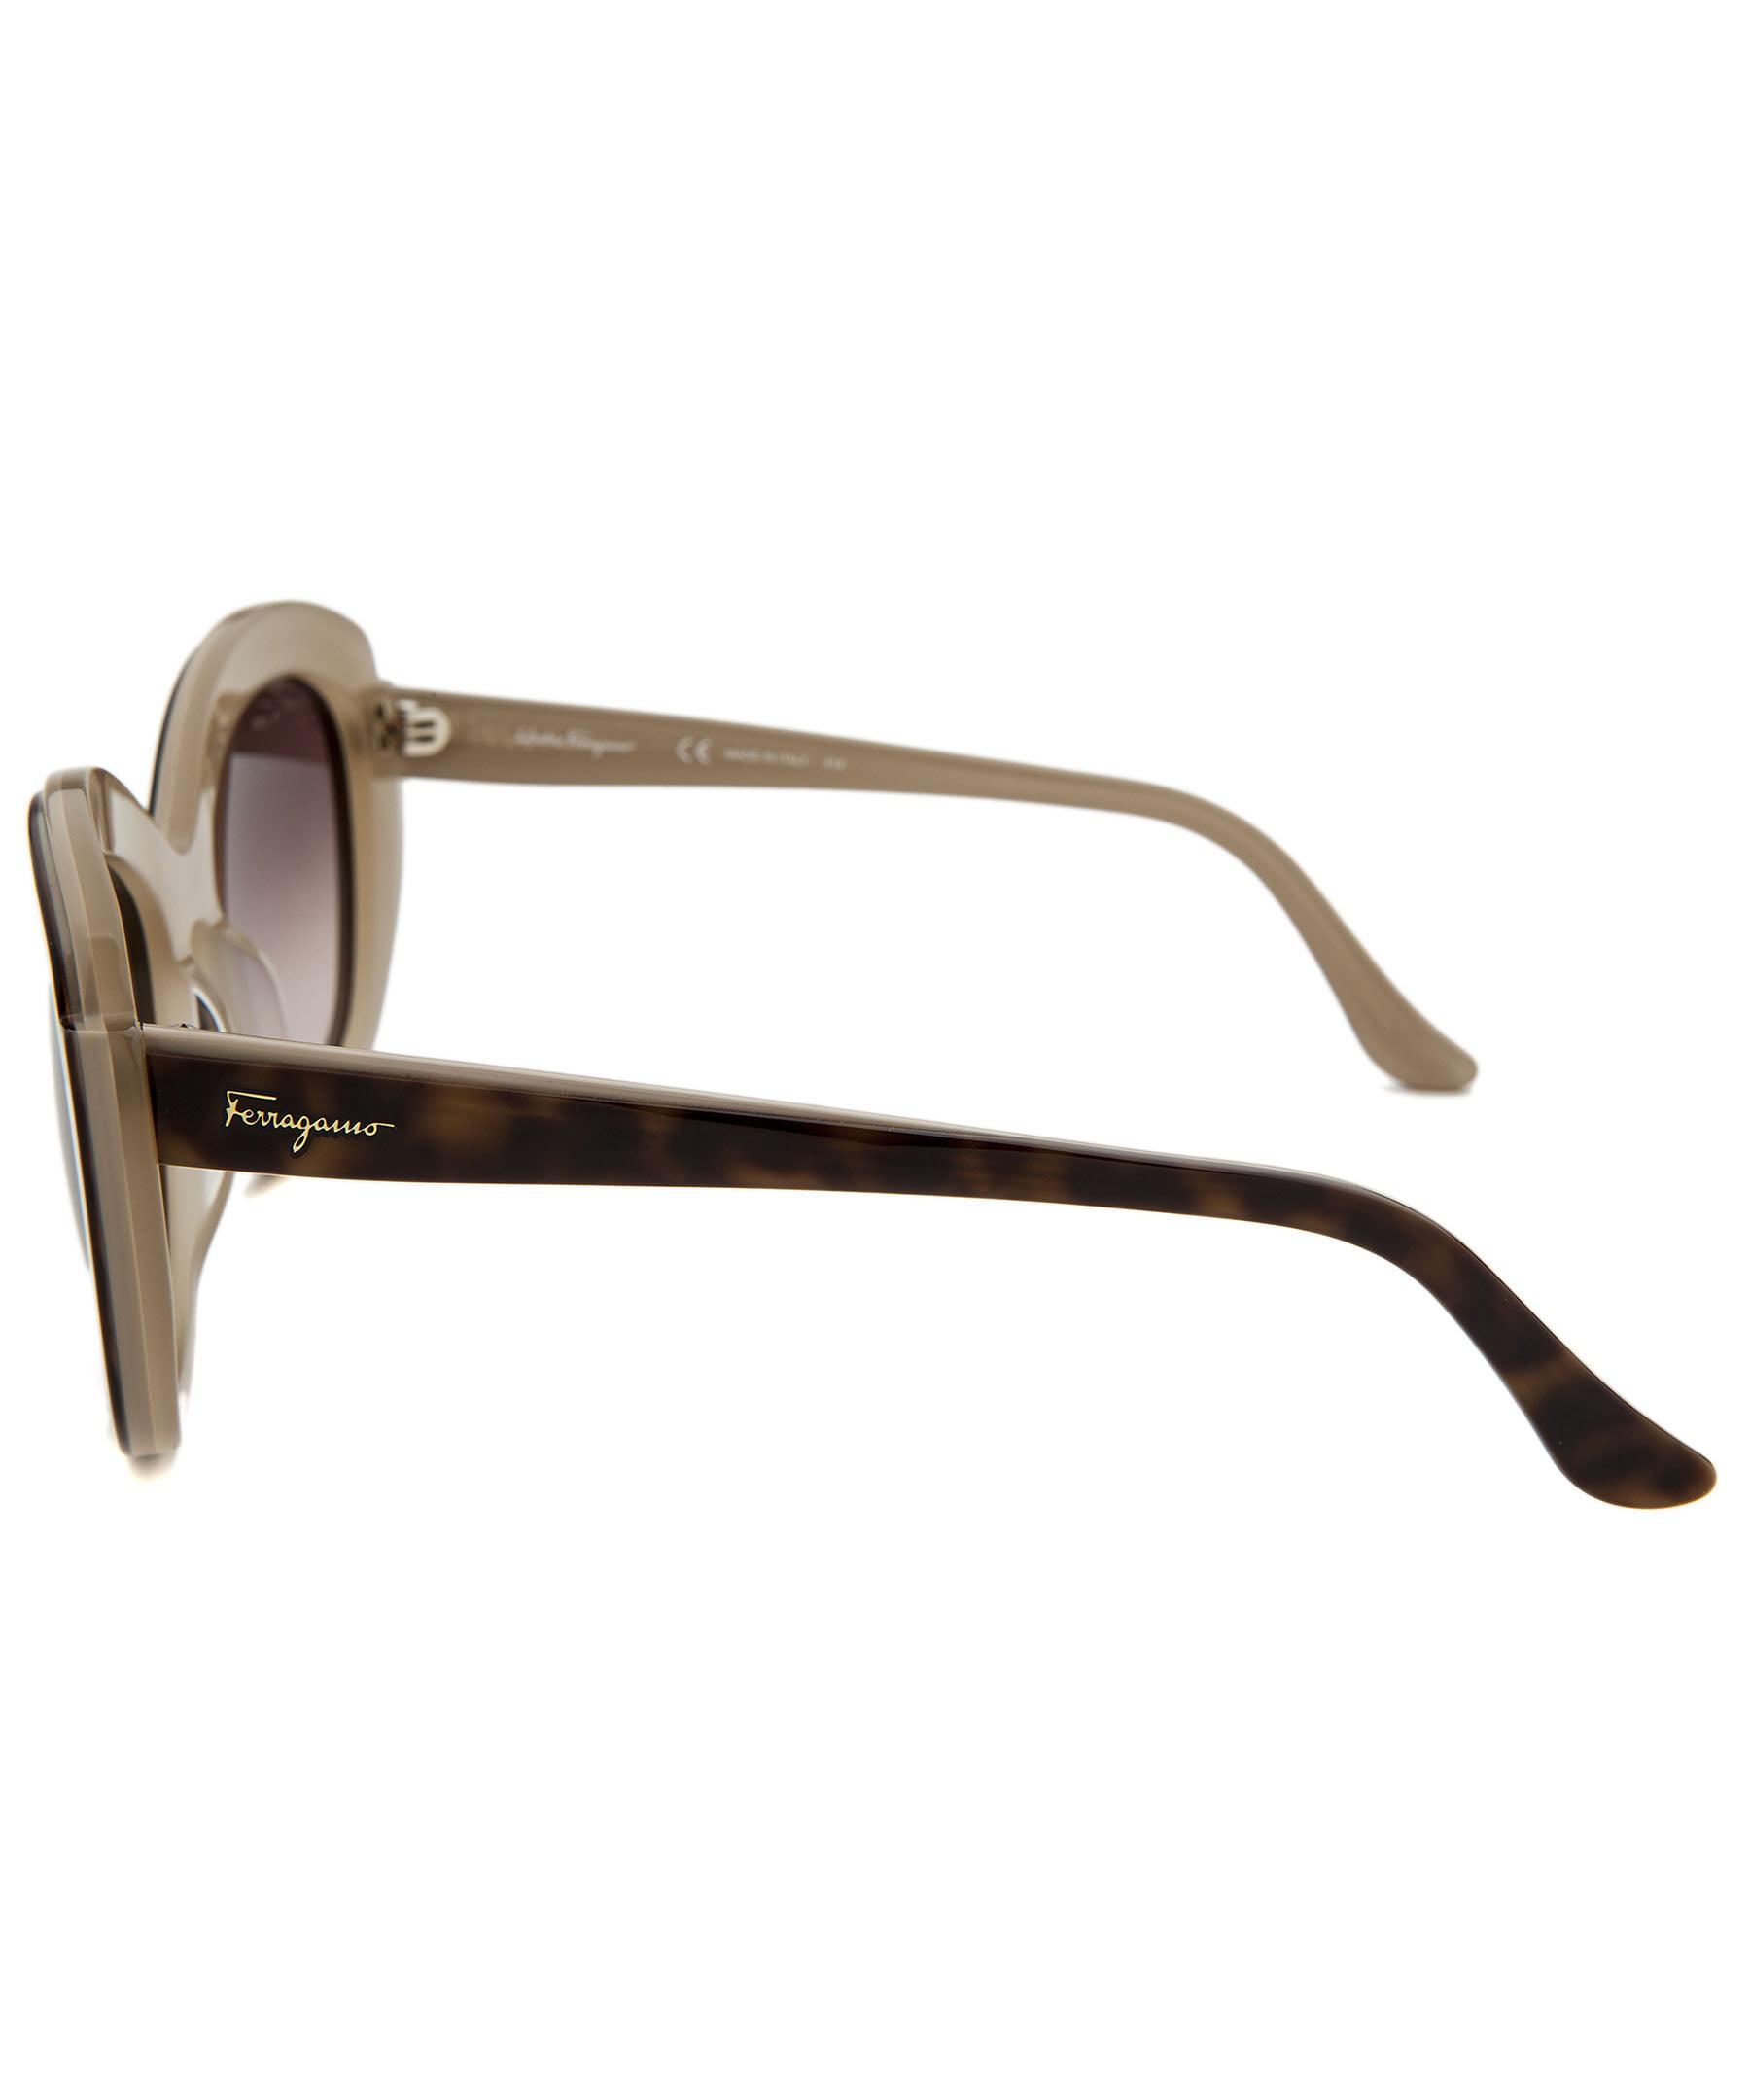 7bc67f6706e Ferragamo - Ferragamo Sunglasses SF726S   Frame  Havana Beige Lens  Brown  Gradient - Walmart.com